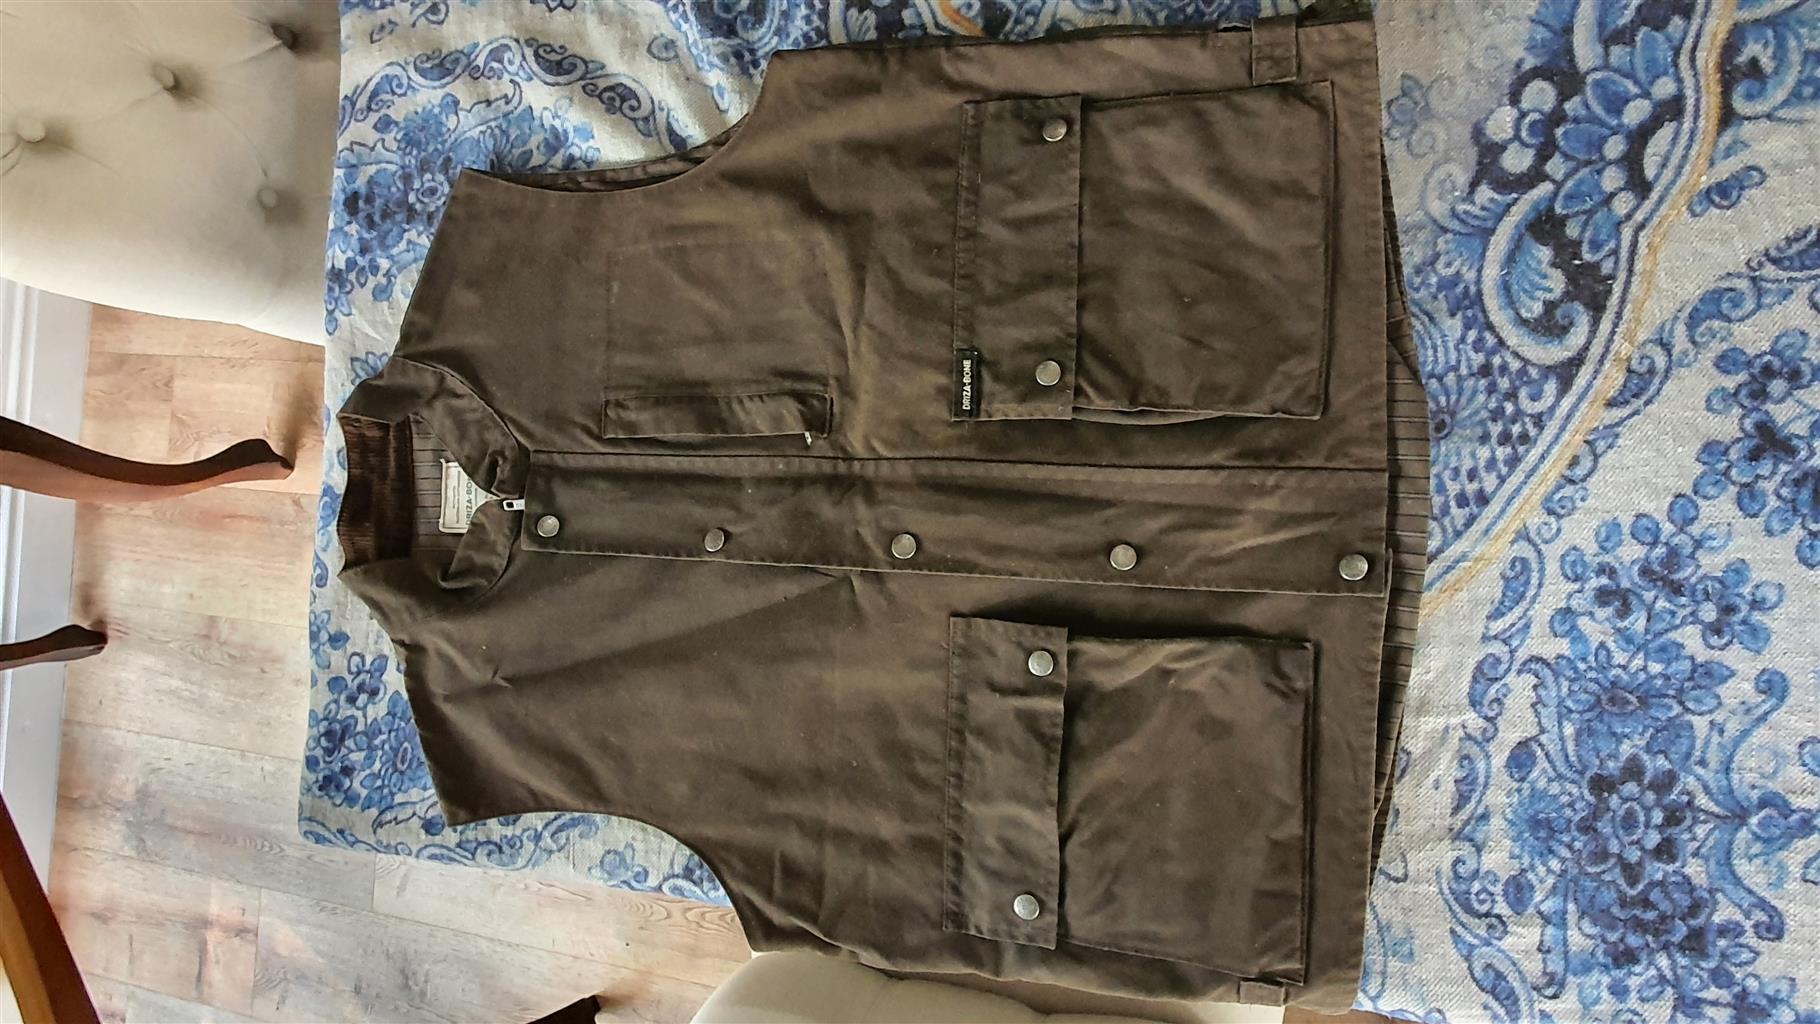 Driza - Bone ( Oilskin Jacket) Size Large